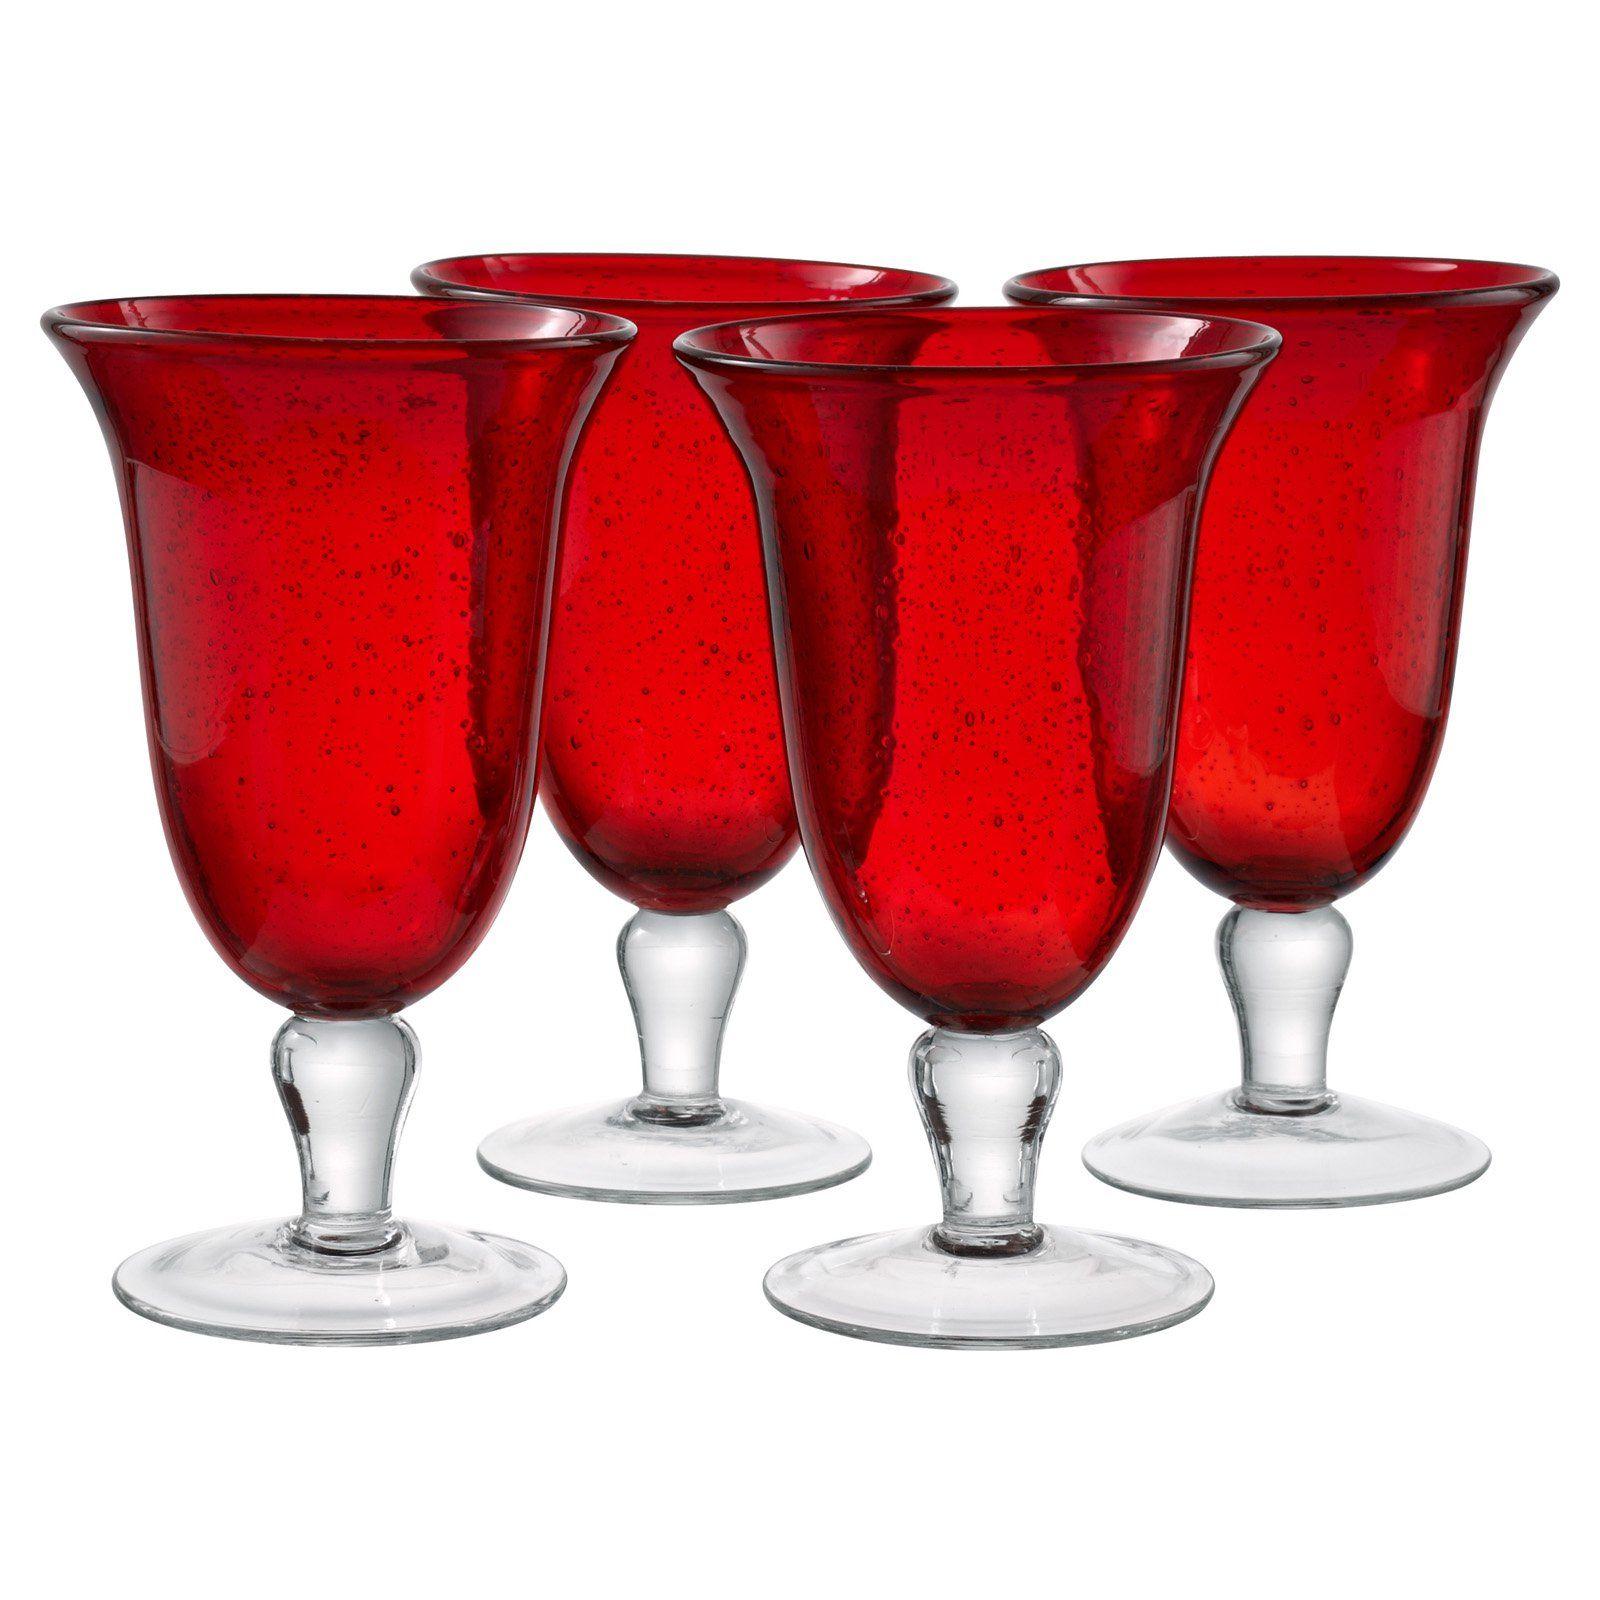 Artland Inc Iris Ice Tea Glasses Set Of 4 Walmart Com In 2020 Glass Set Iced Tea Glasses Tea Glasses